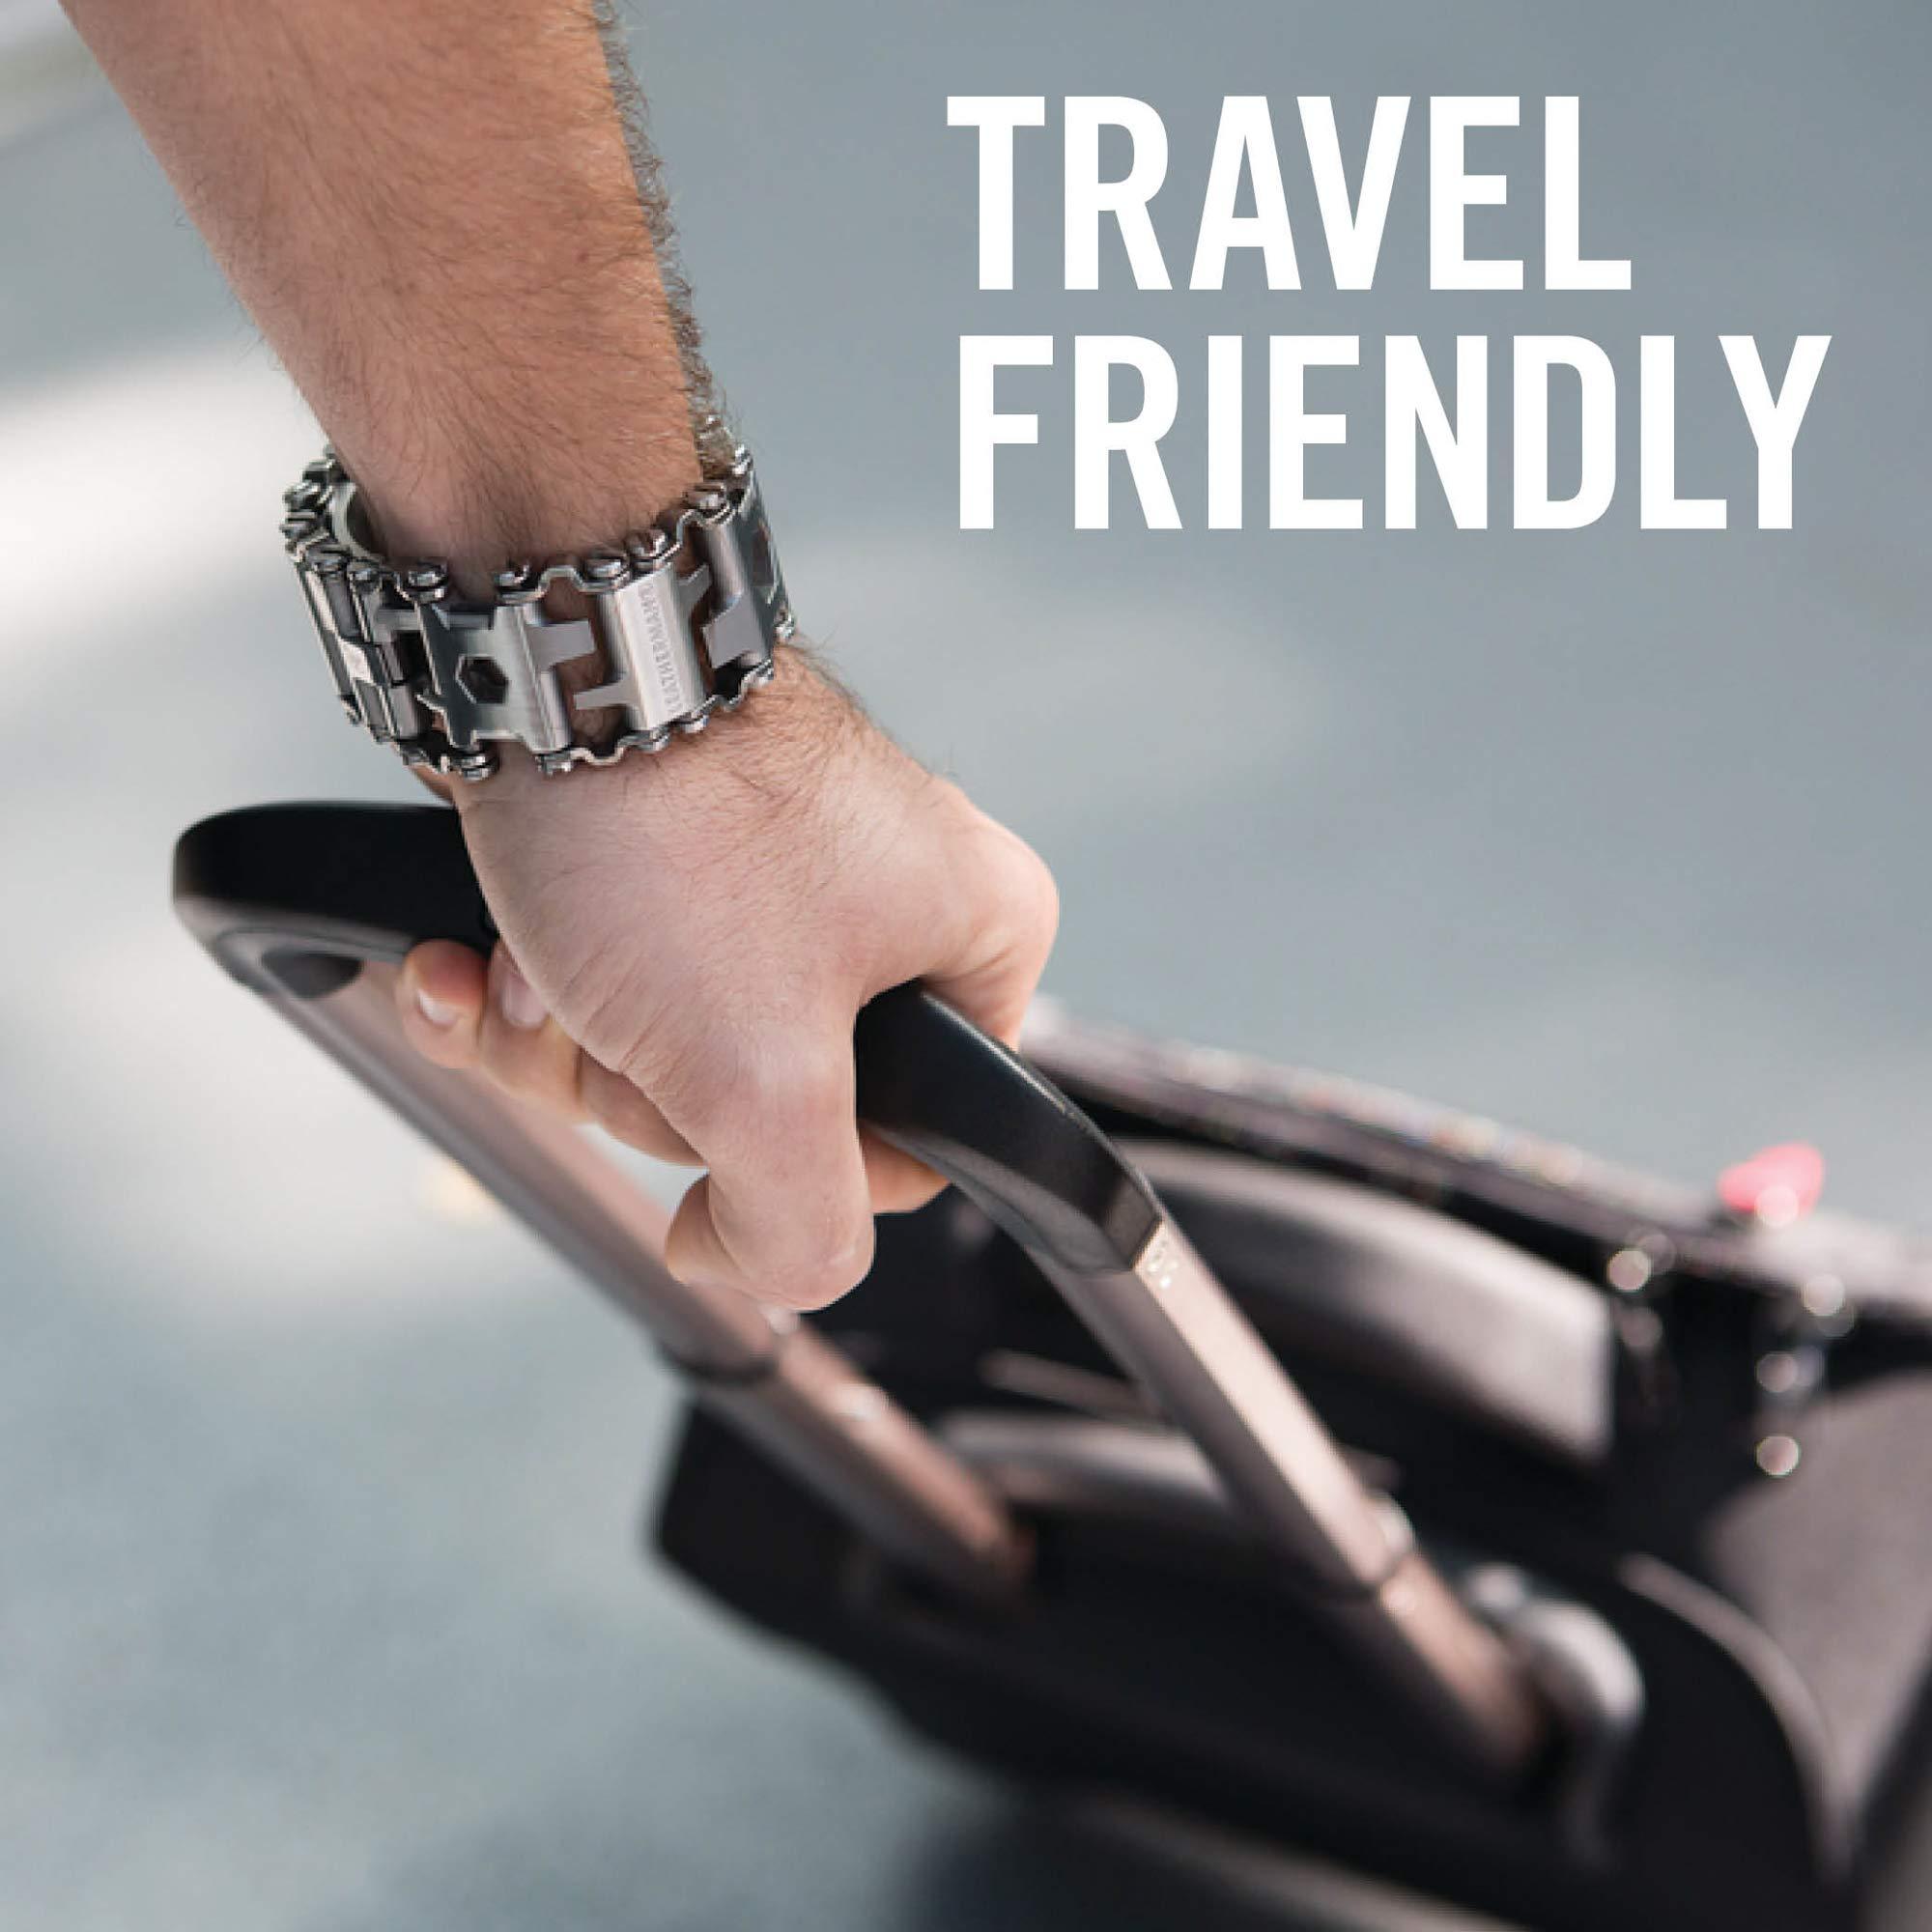 LEATHERMAN - Tread Bracelet, The Original Travel Friendly Wearable Multitool, Black by LEATHERMAN (Image #5)